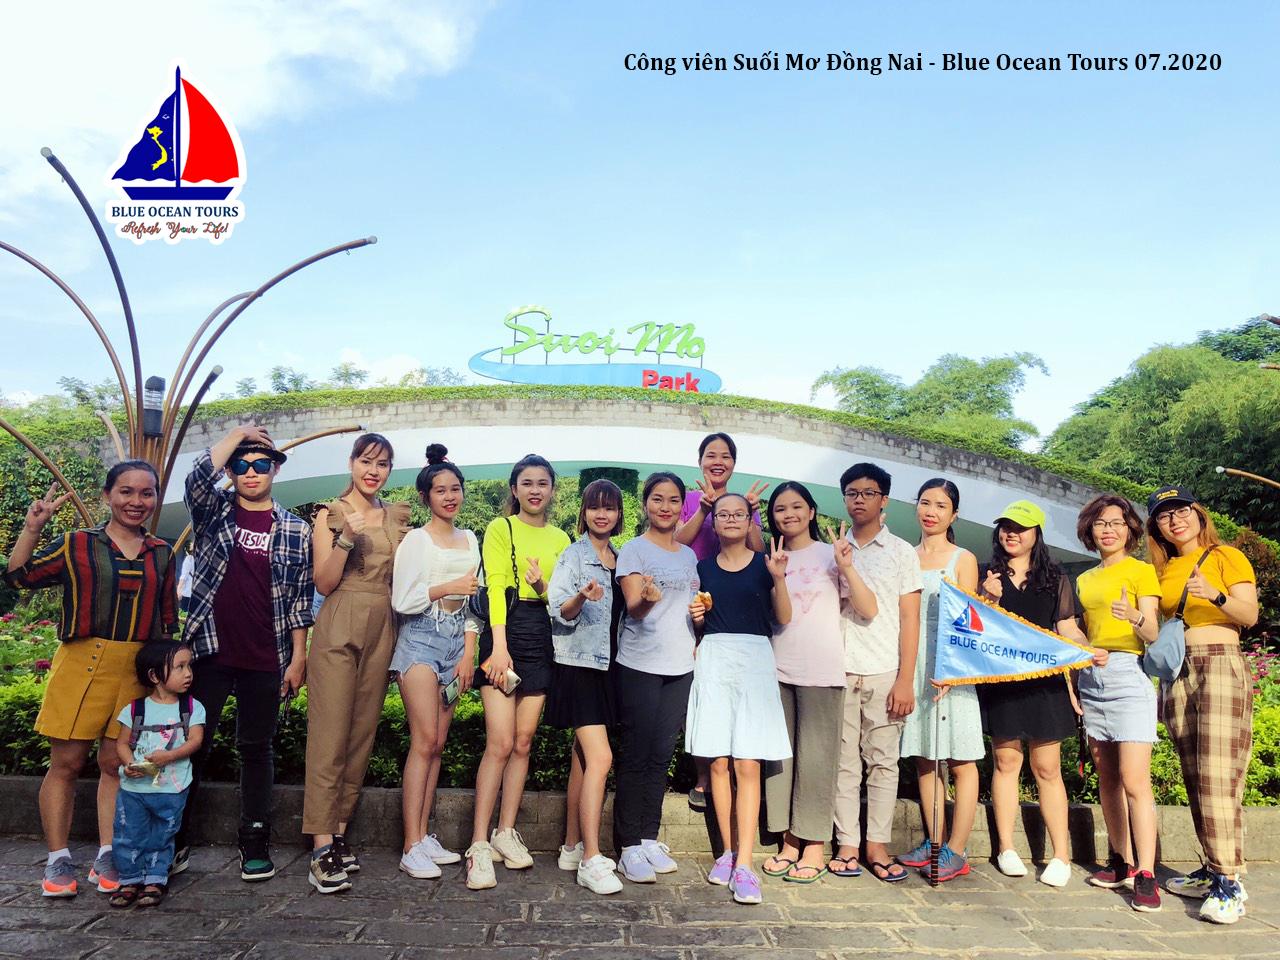 Suối Mơ Park ở Đồng Nai - Đoàn Blue Ocean Tours 07.2020